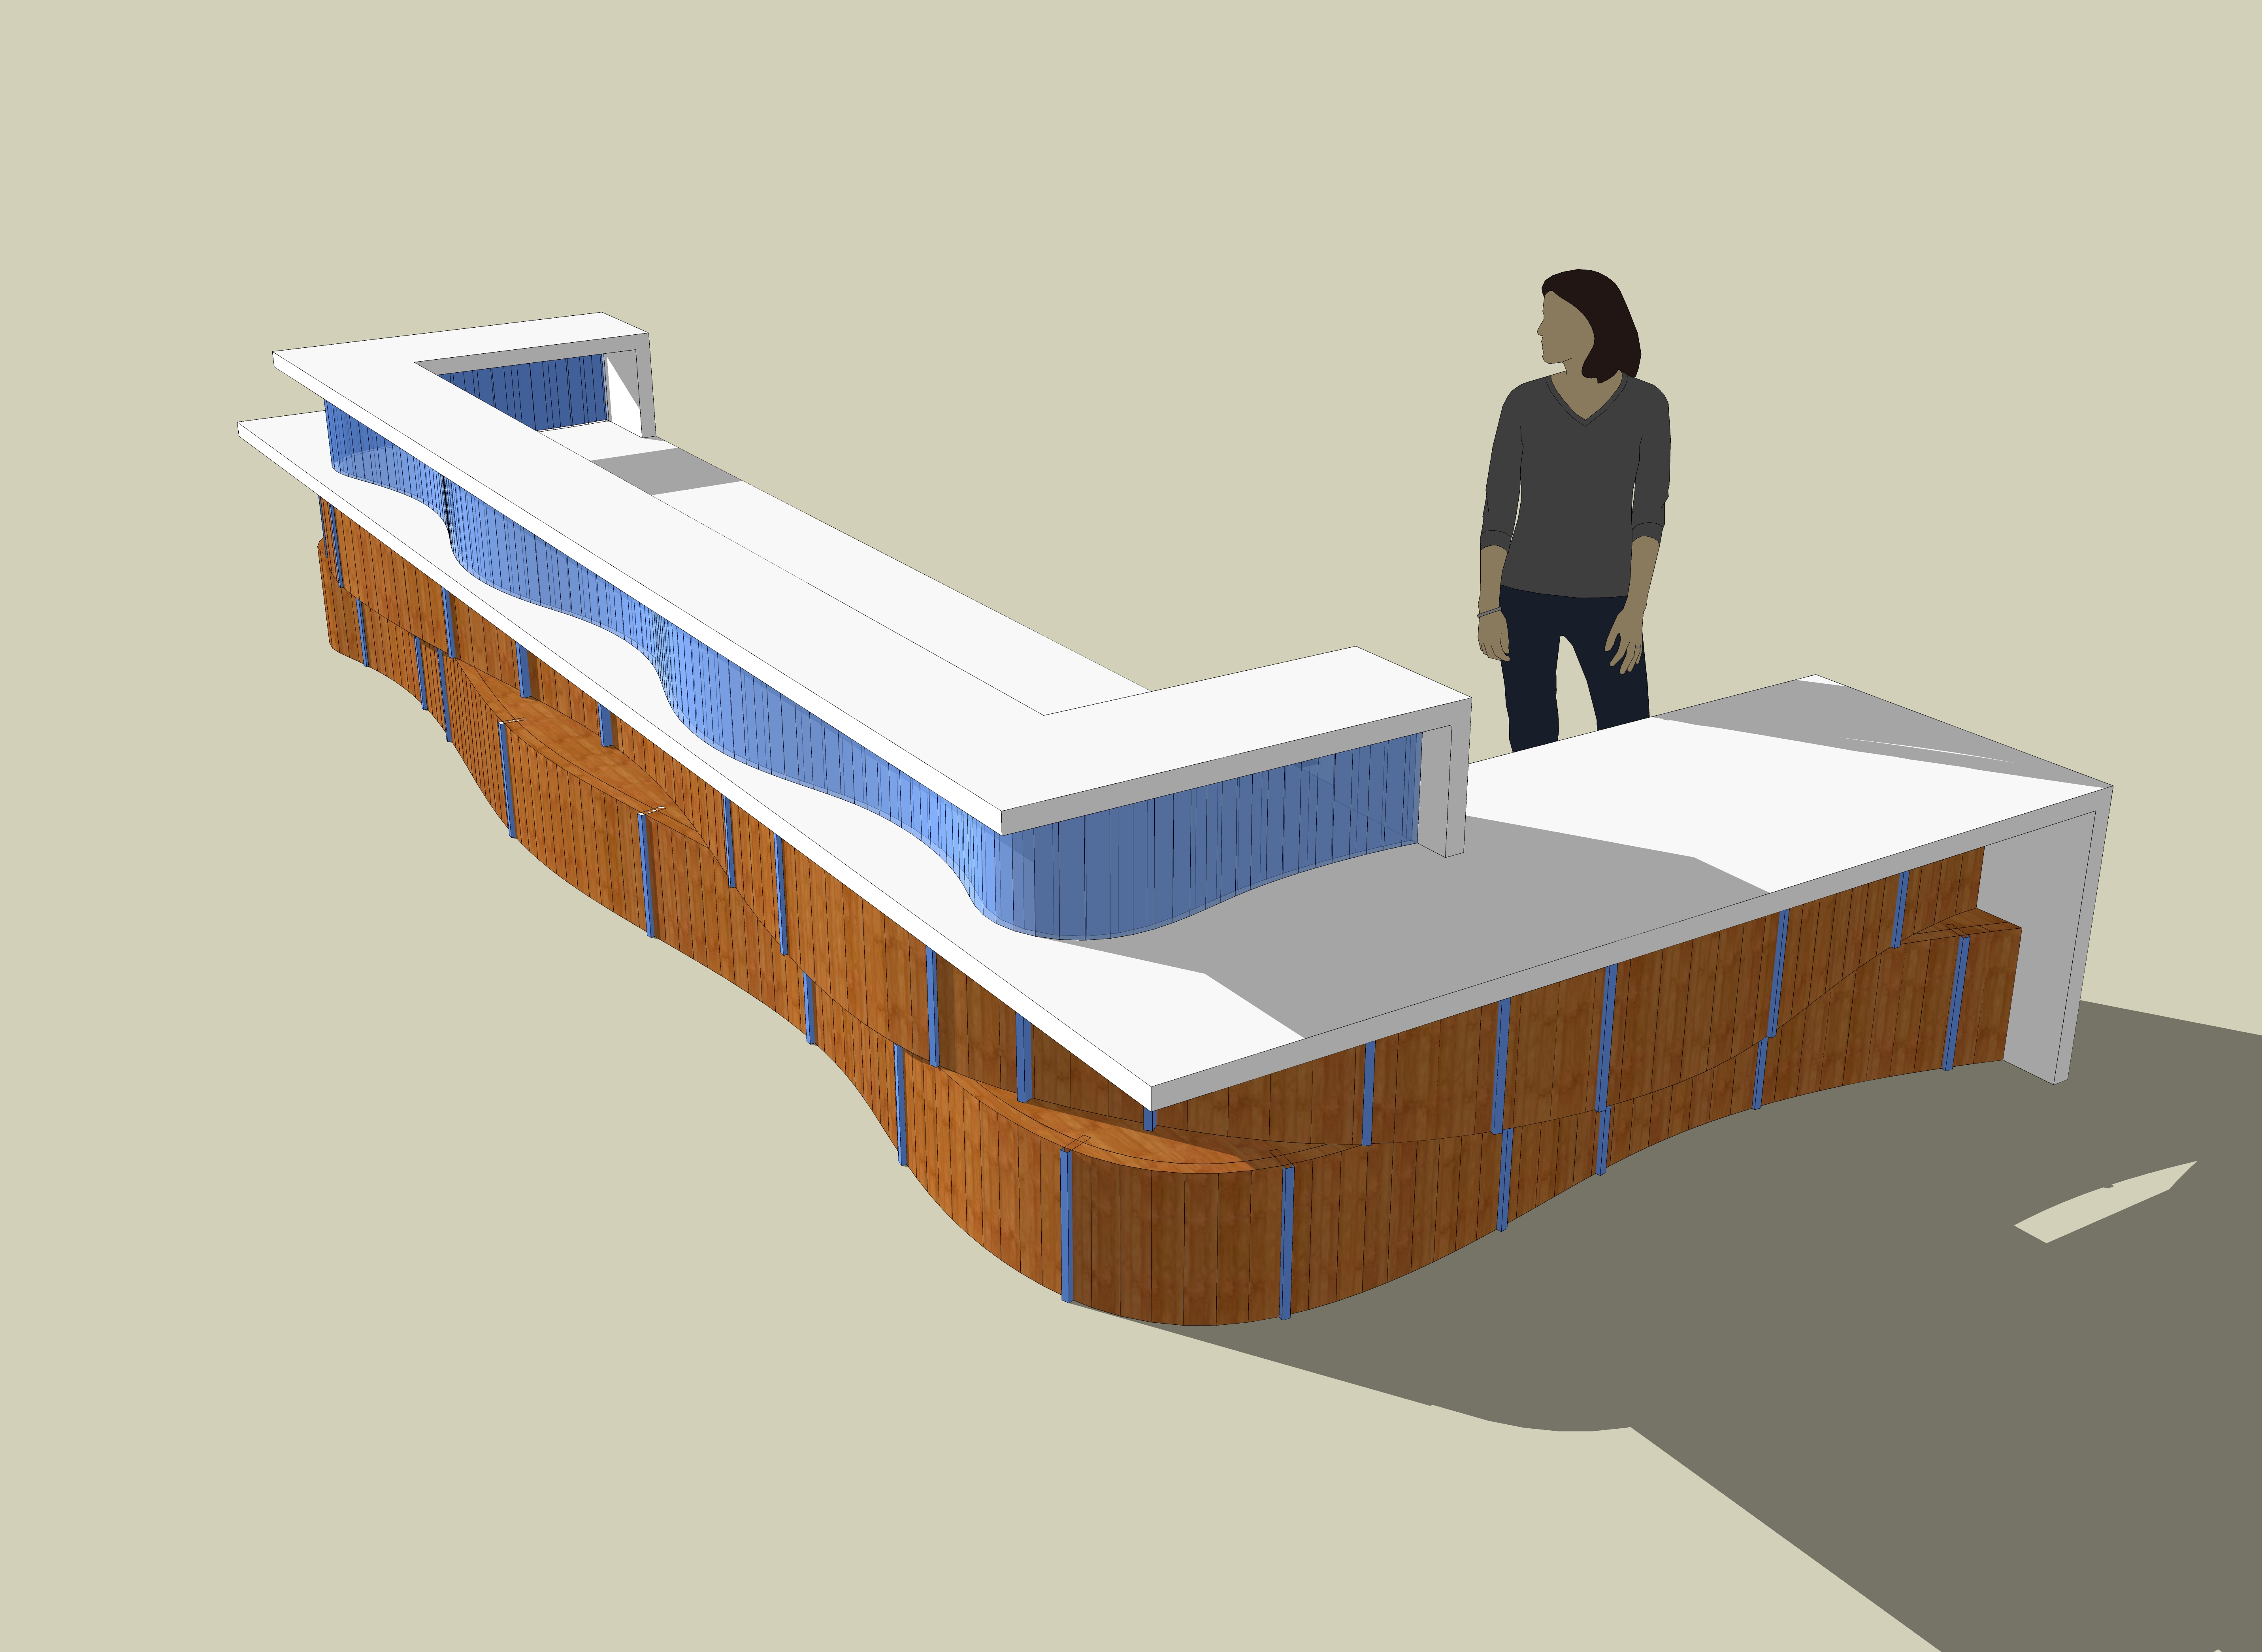 Original Architects Concept 01